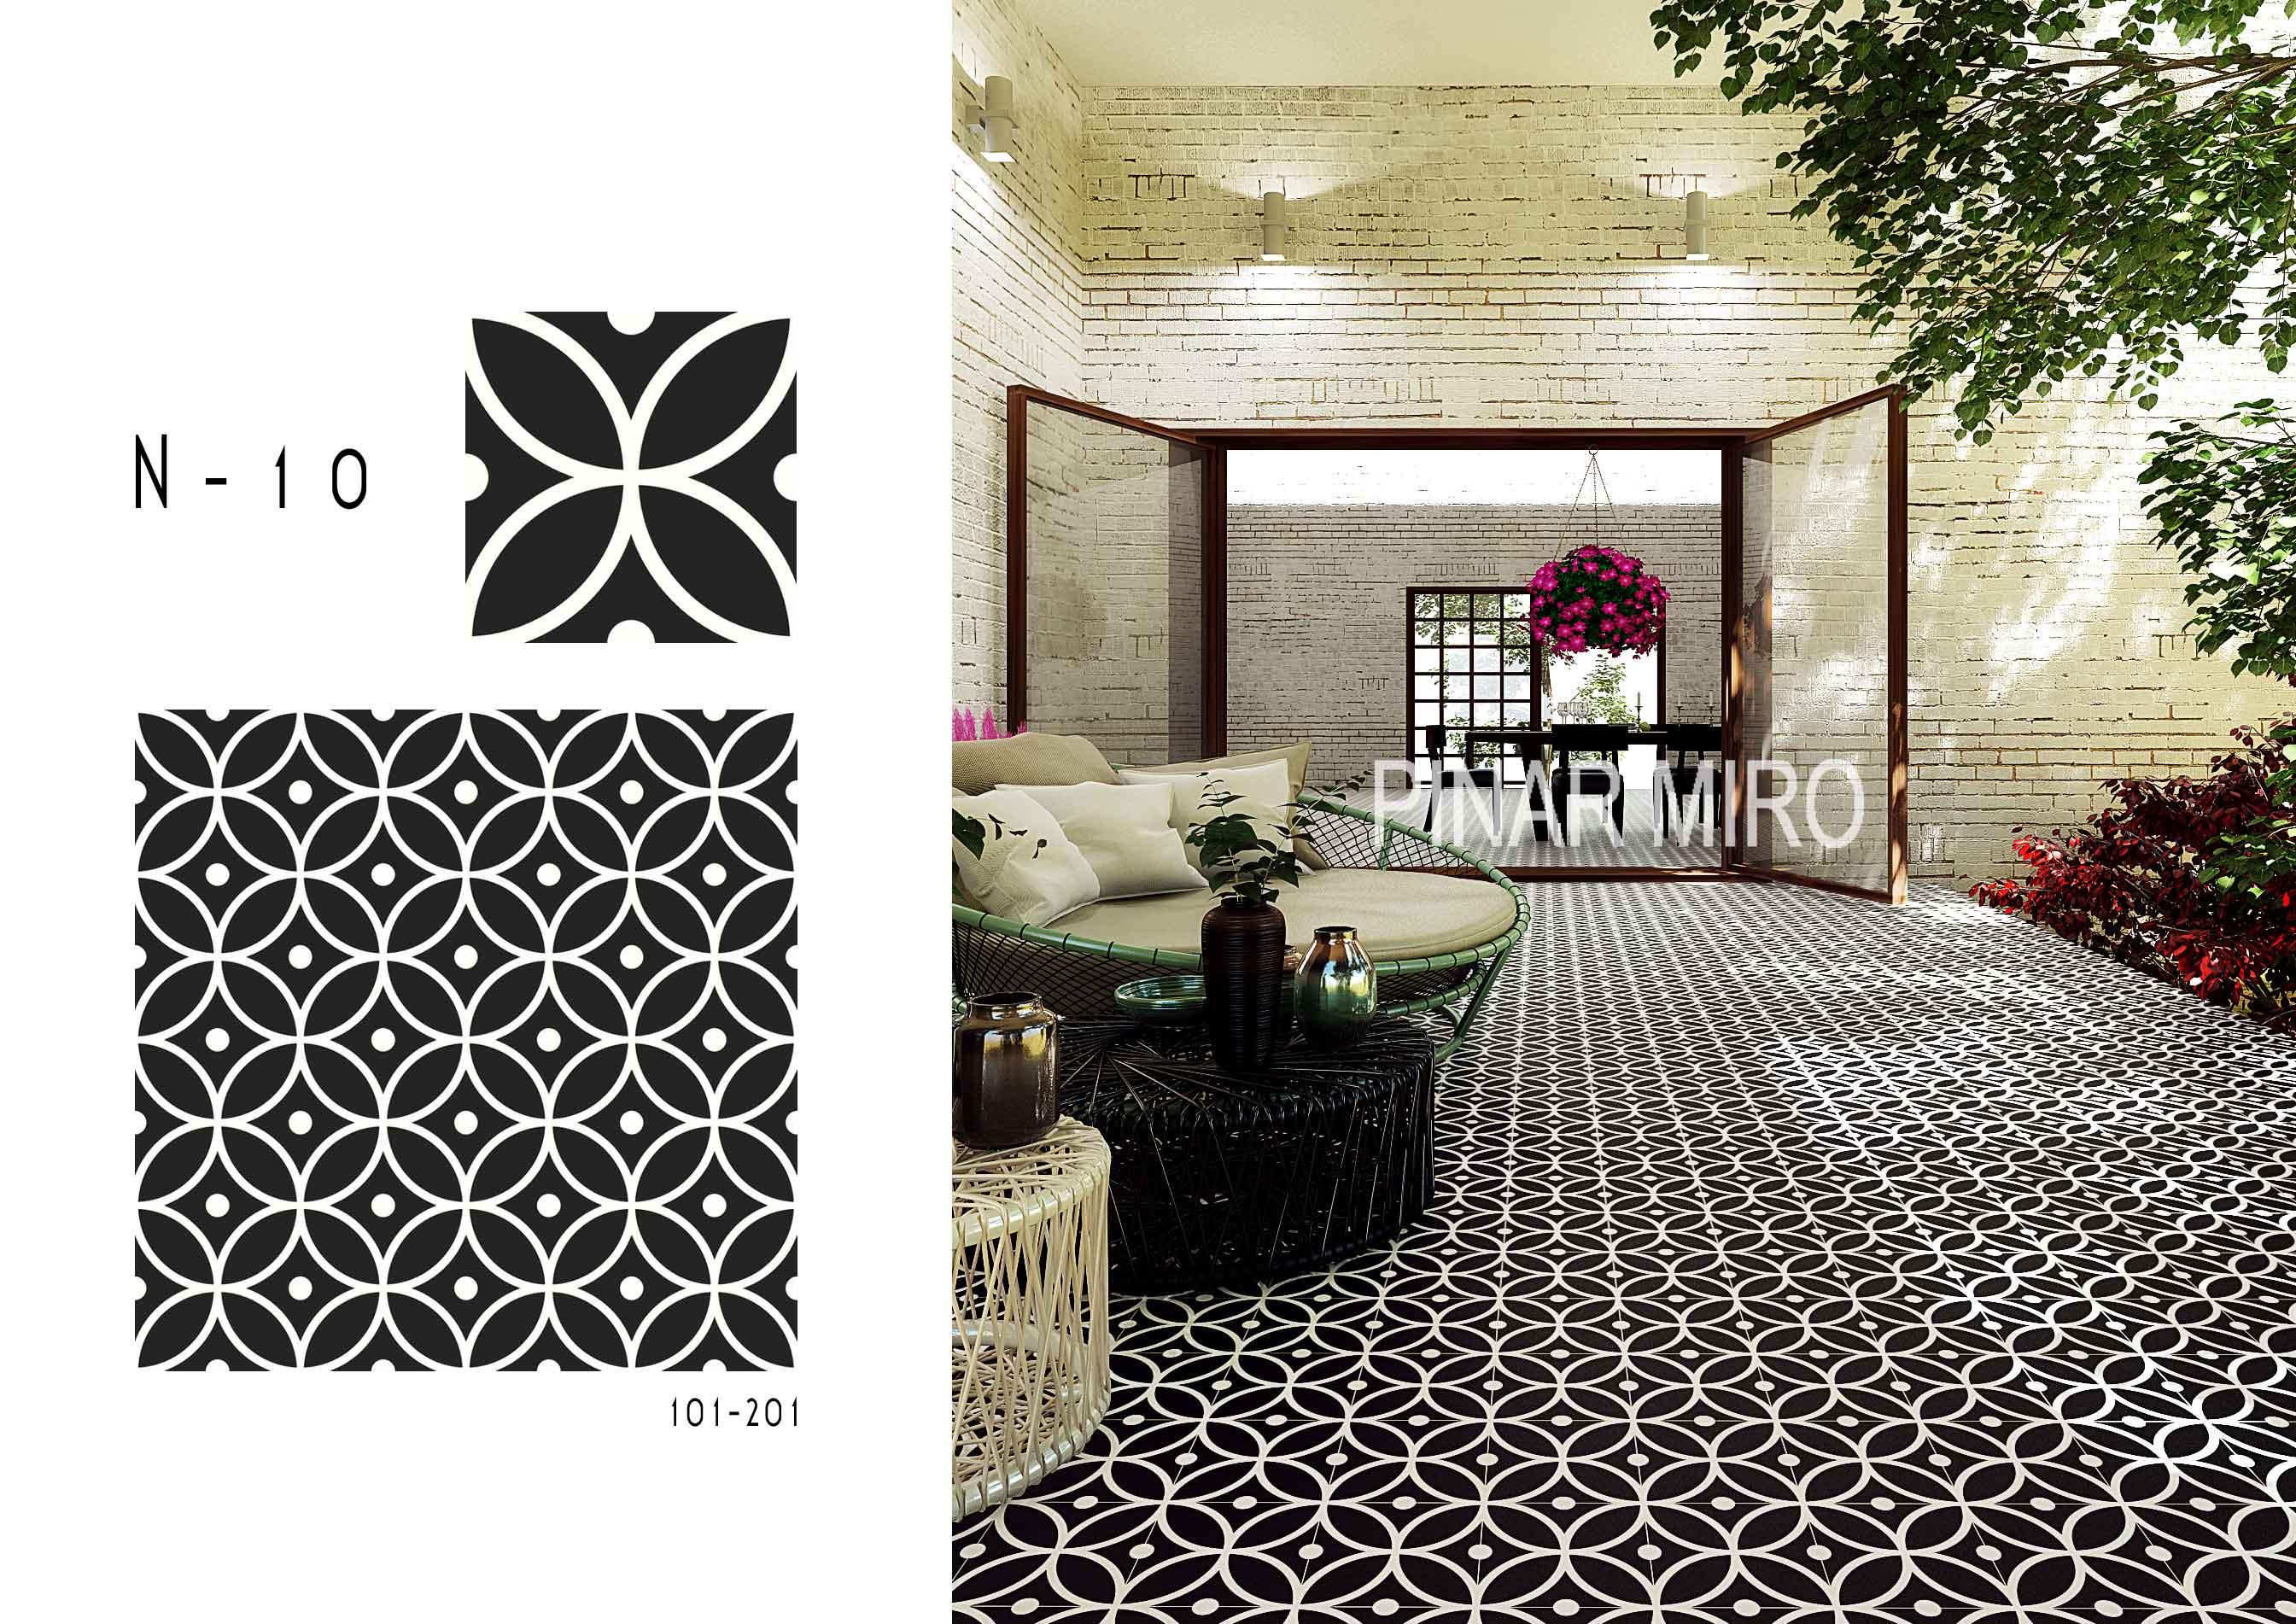 3-n10-pinar-miro-cement-tiles